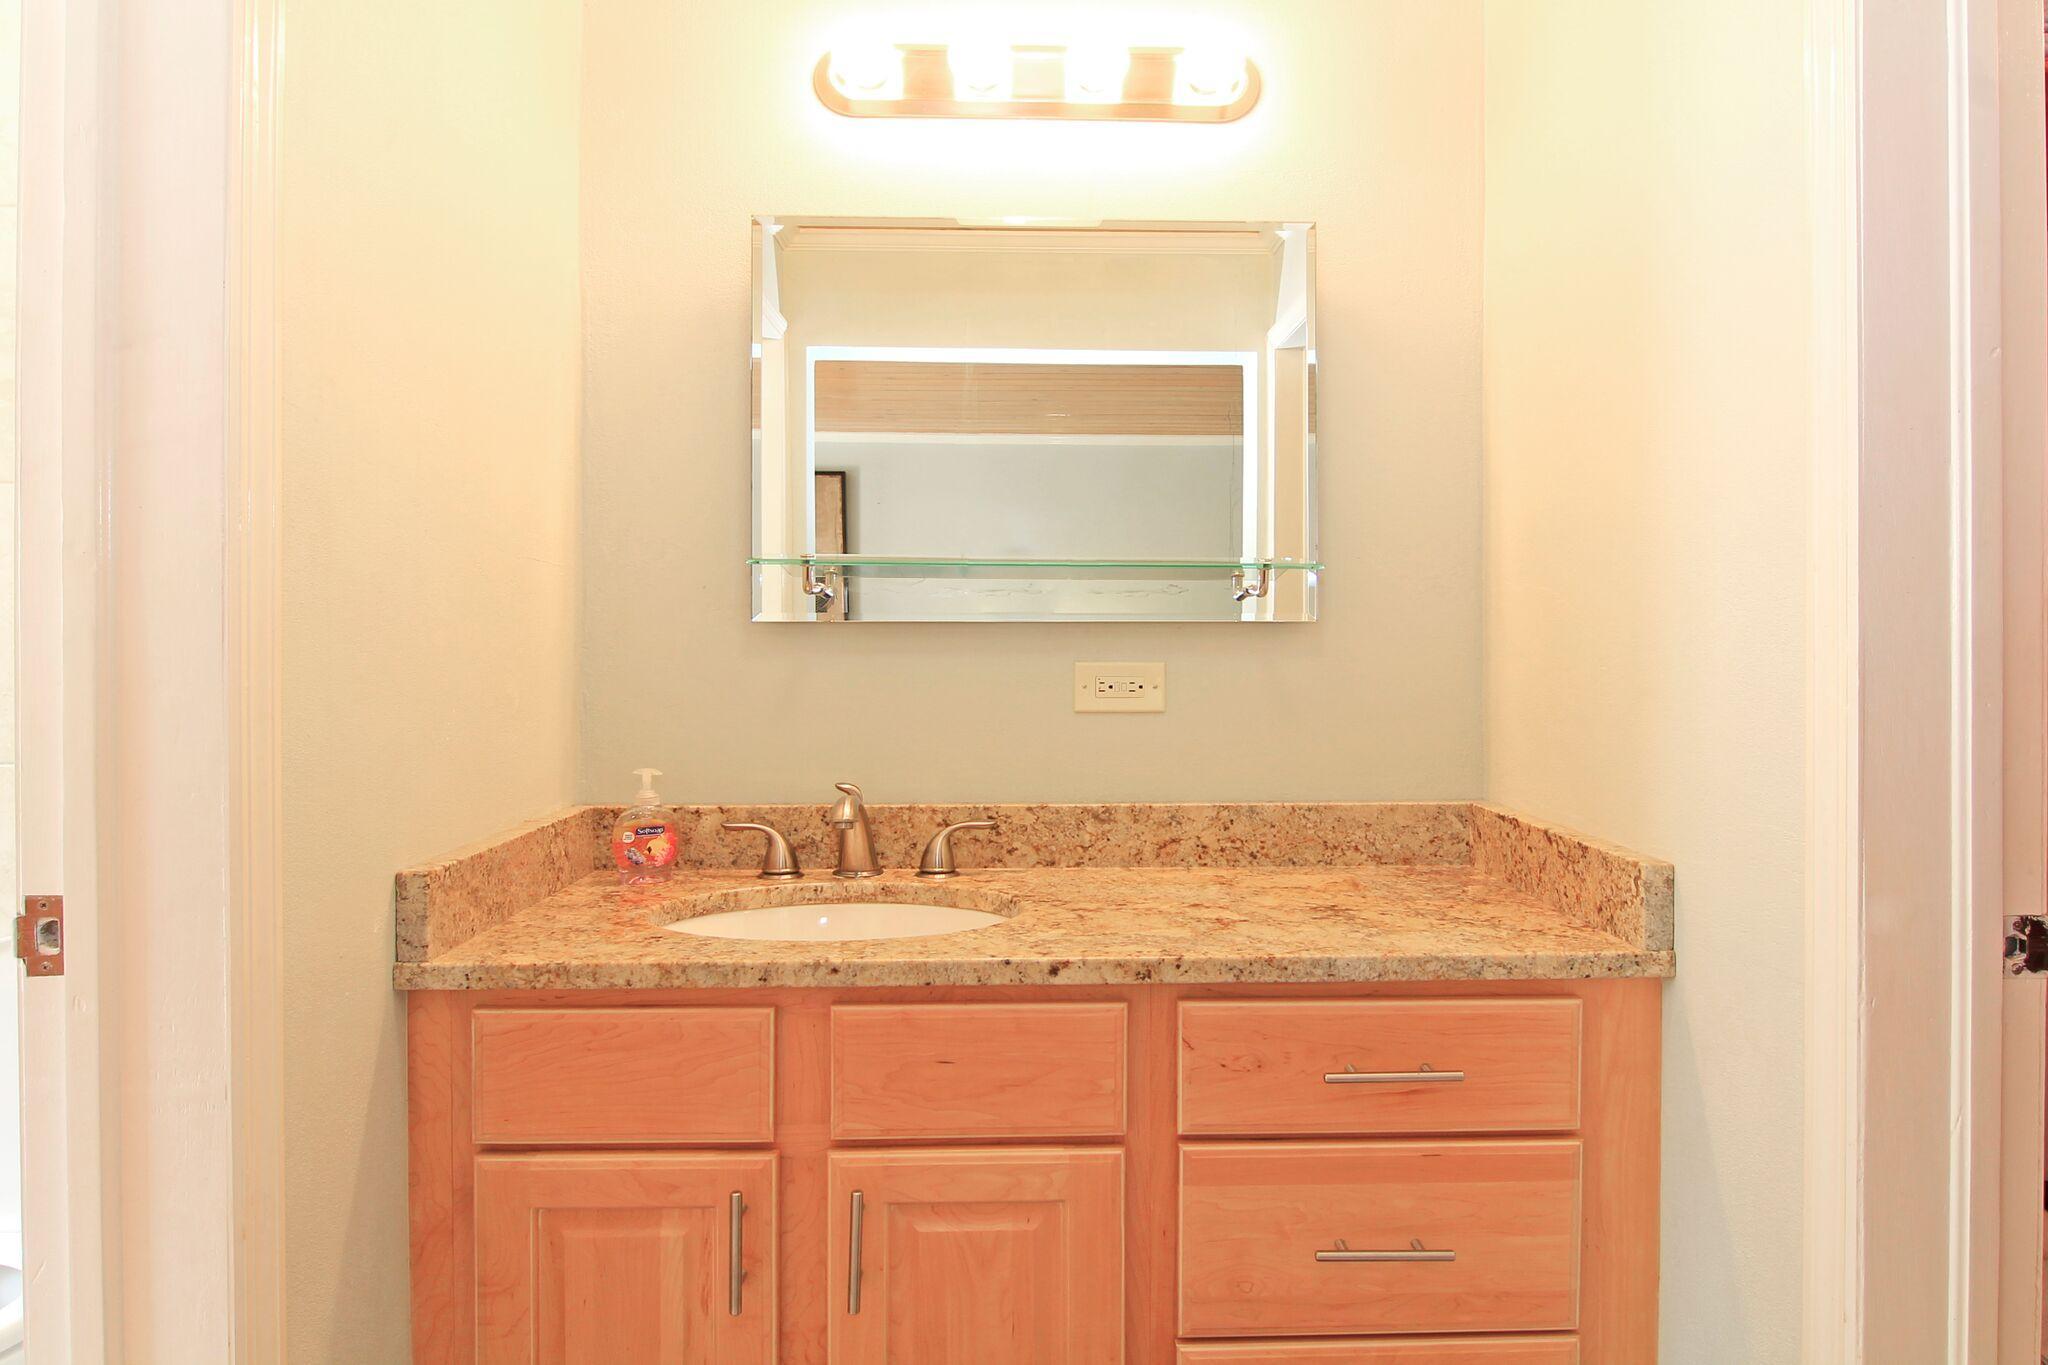 Studio Bath - Vanity Area